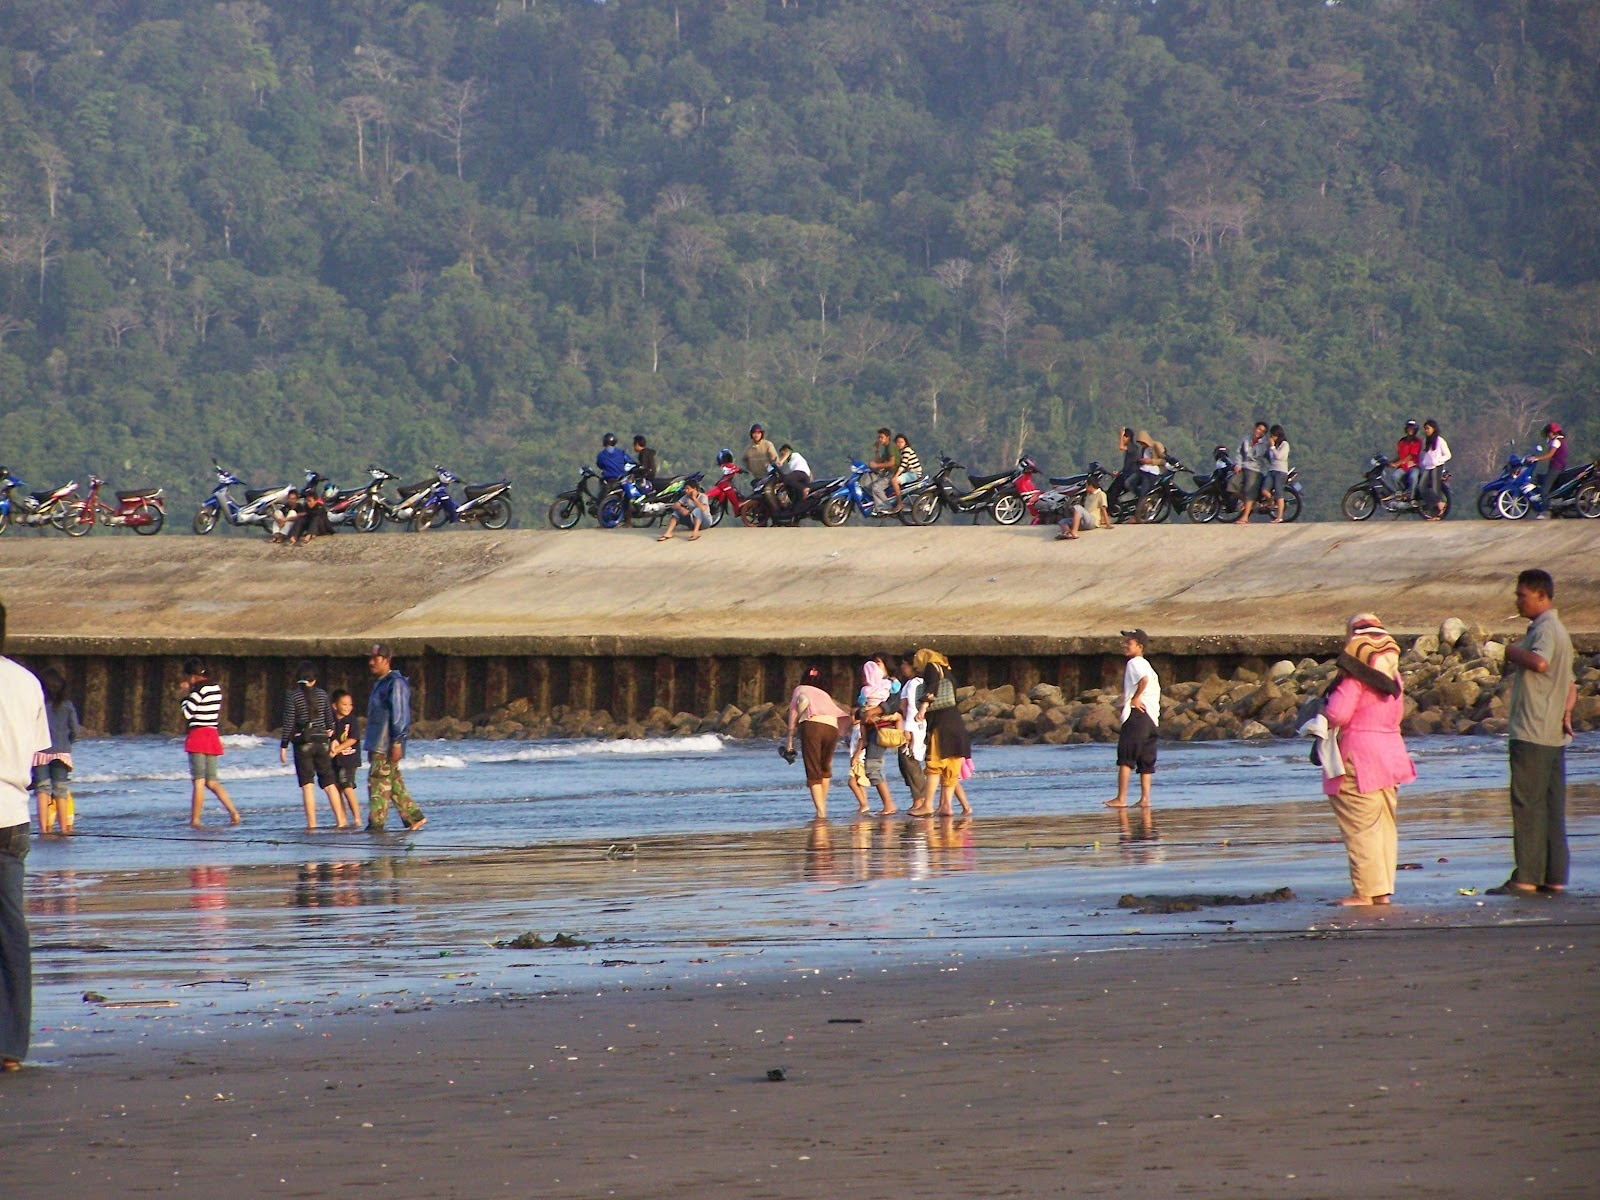 Menikmati Pantai Teluk Penyu Cilacap Kab